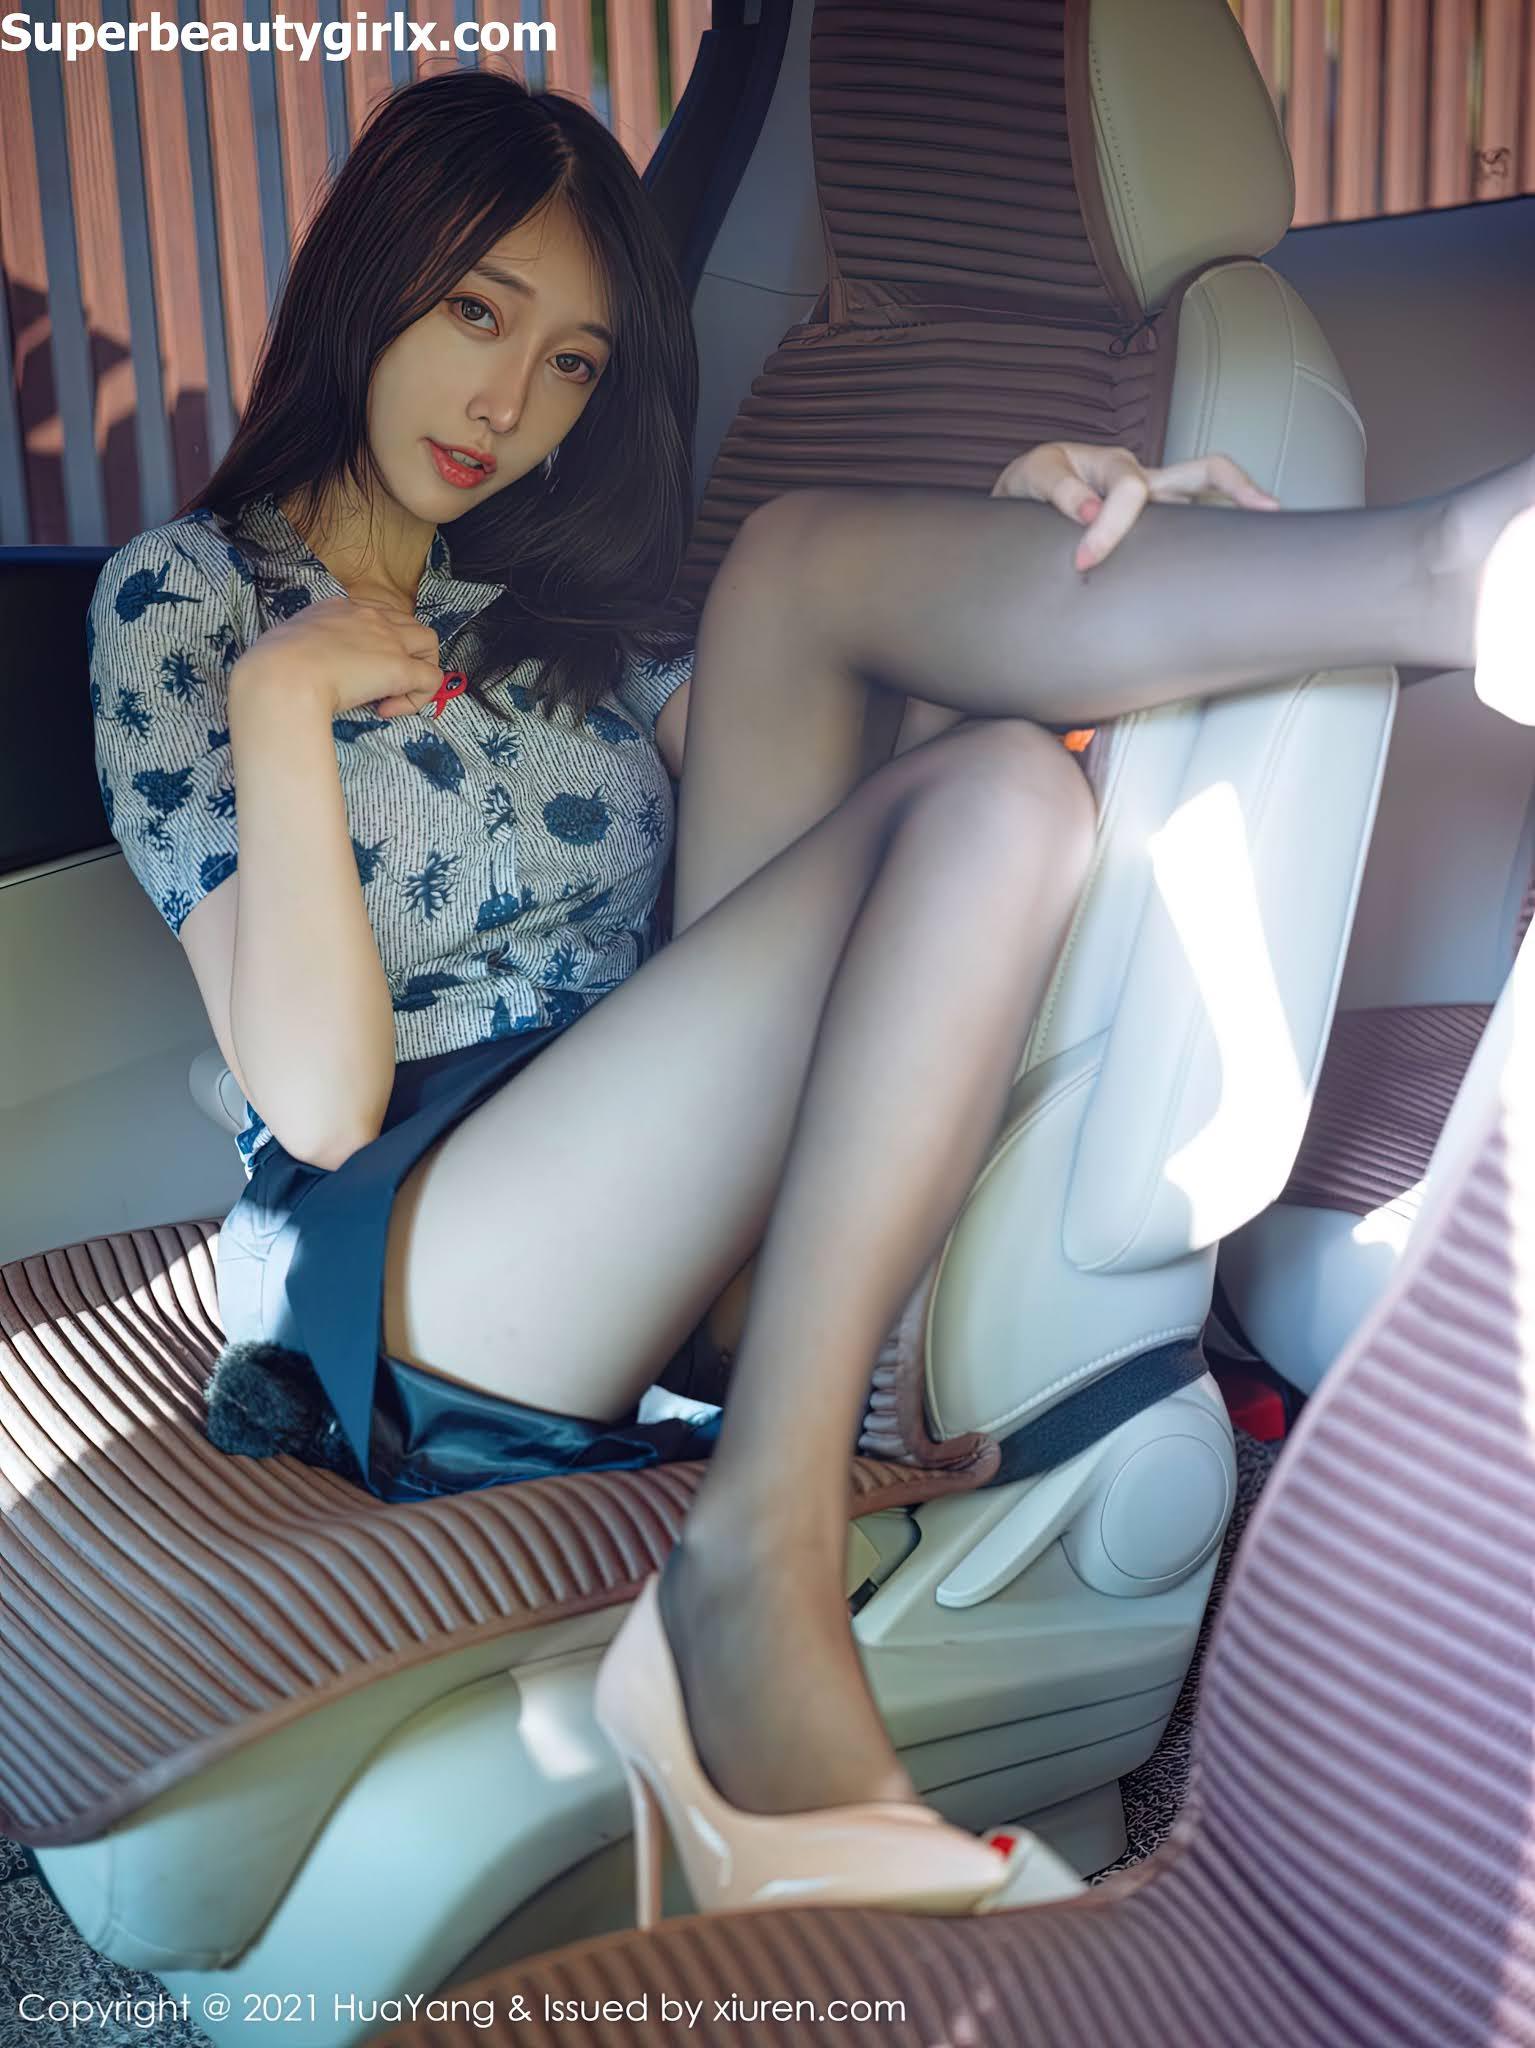 HuaYang-Vol.394-er-Superbeautygirlx.com